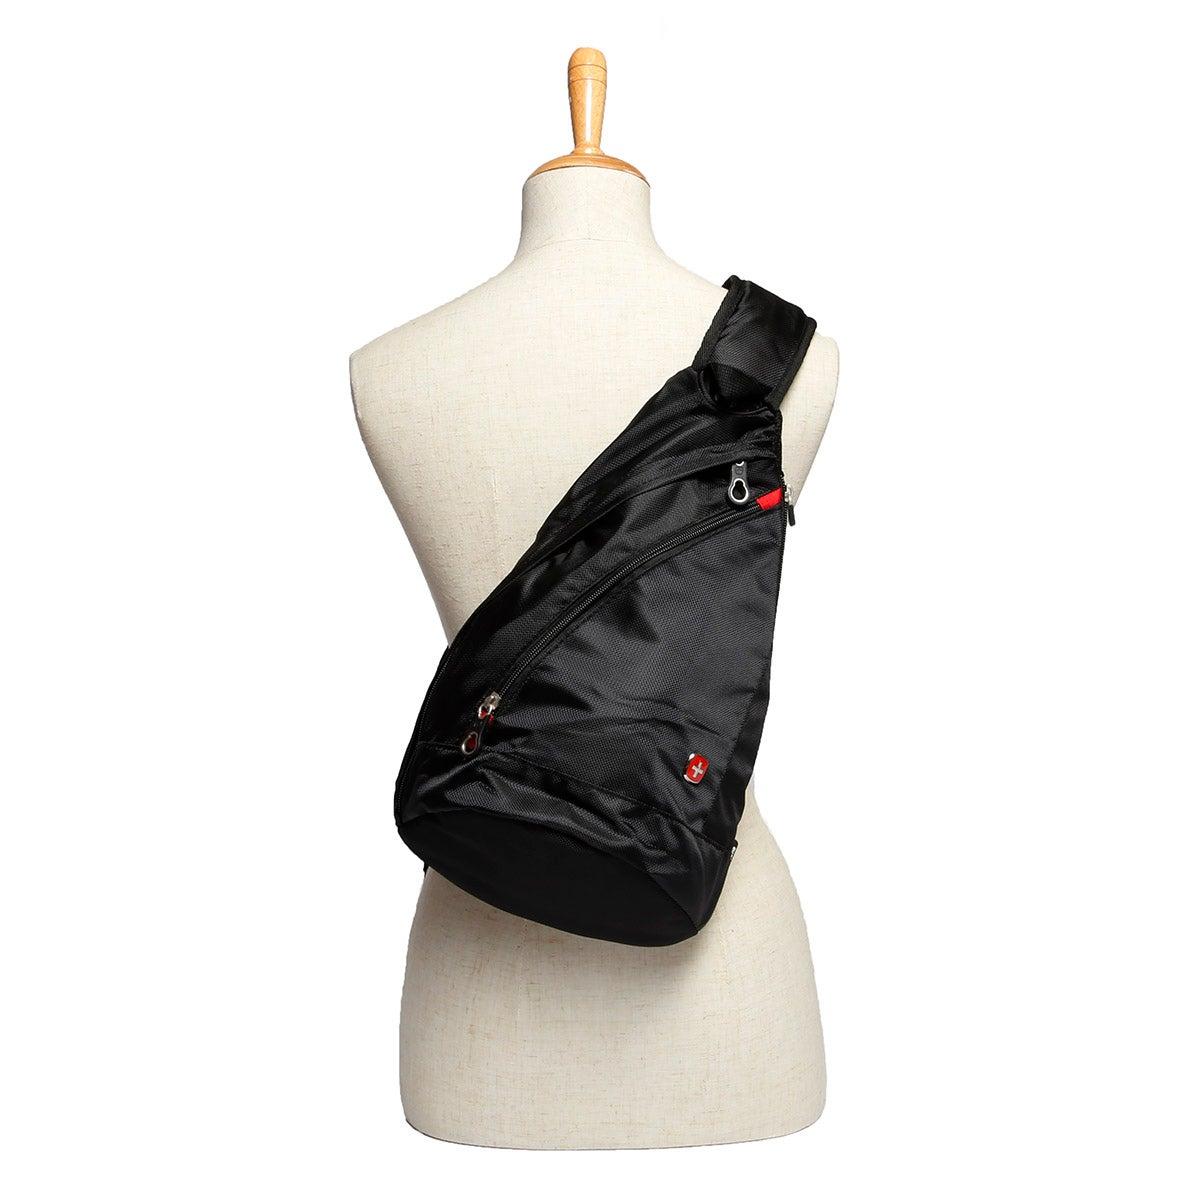 Unisex Swiss Gear black mini sling bag